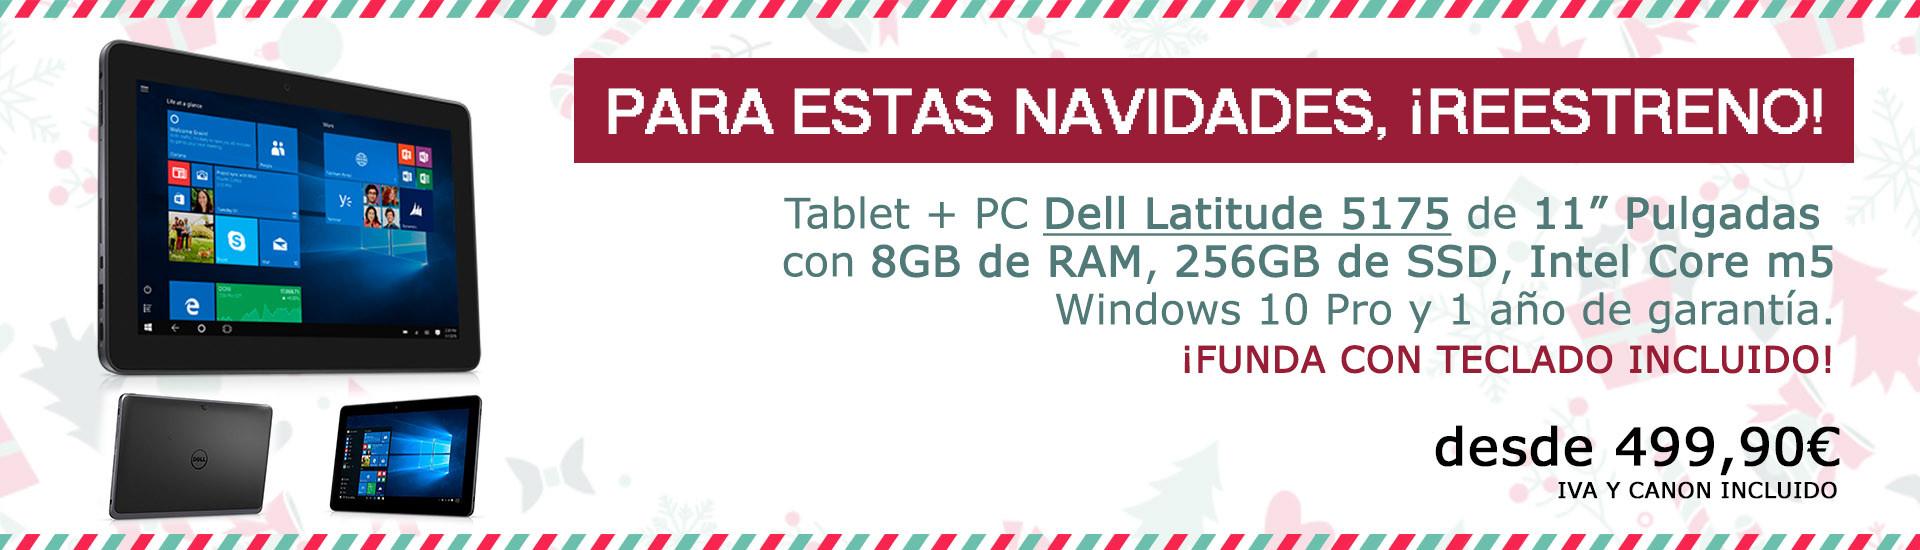 Tablet PC Navidades